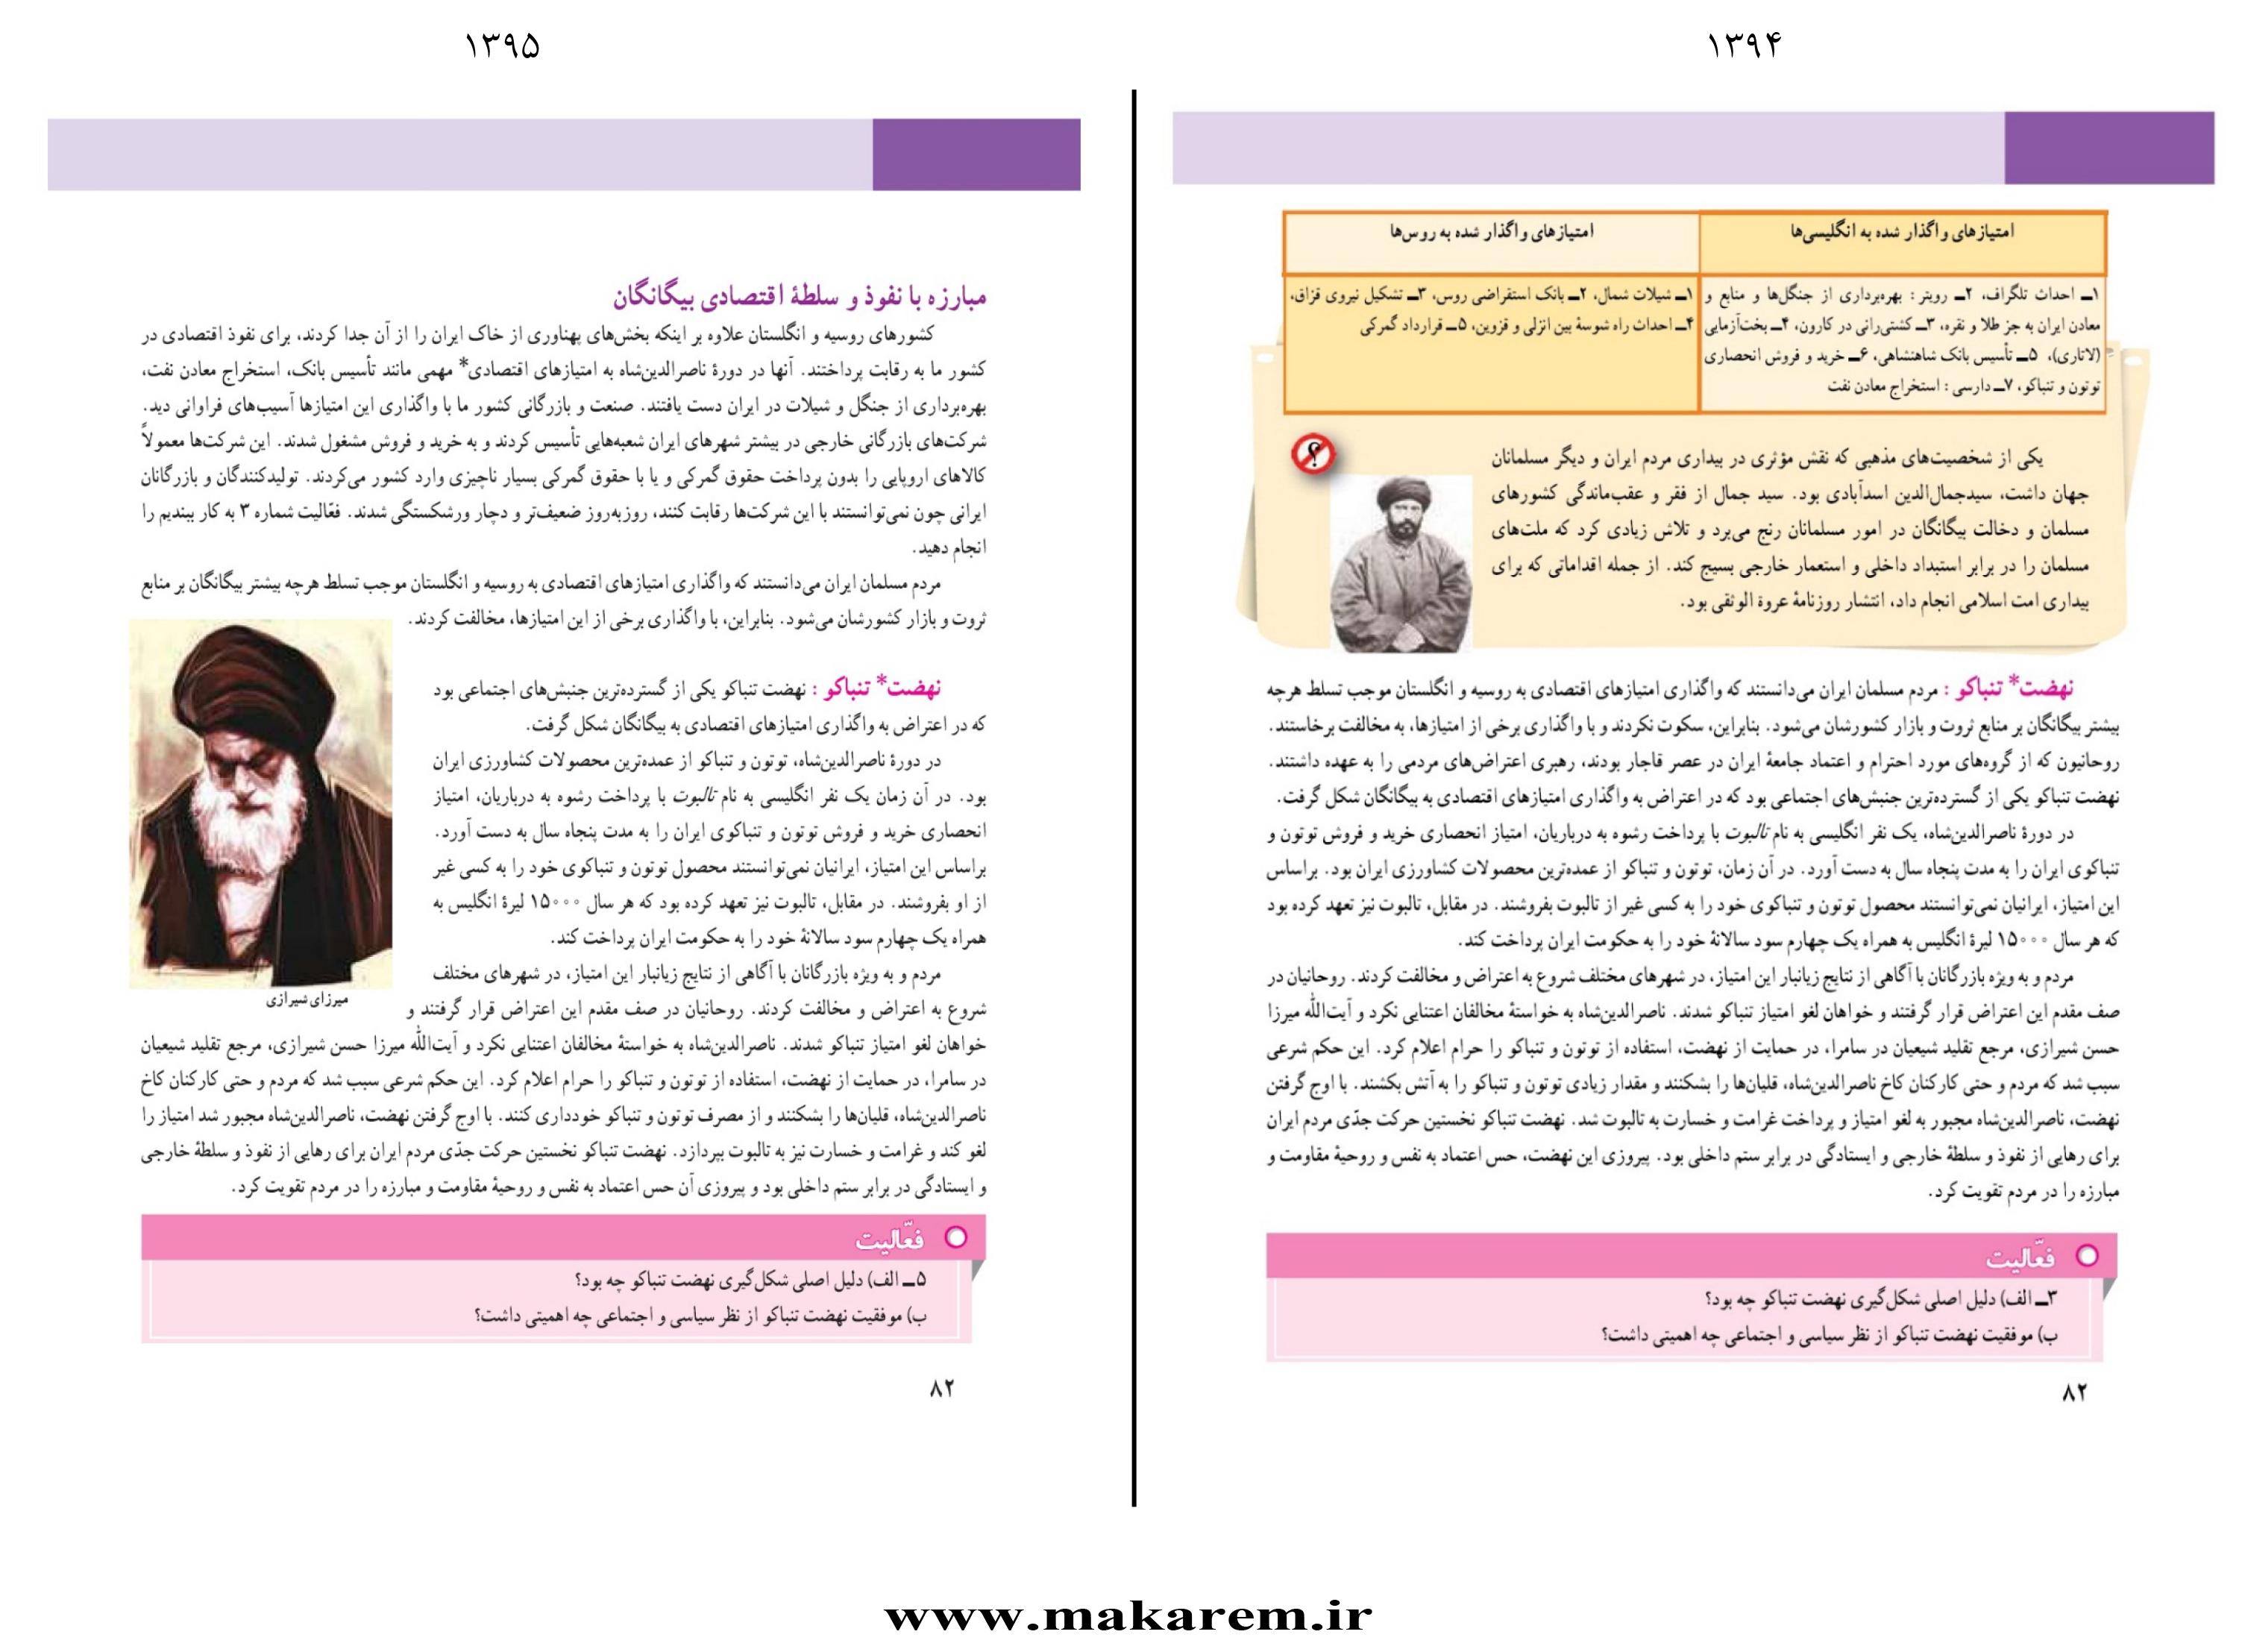 اجتماعی-مدرسه الامام امیر المومنین (ع)